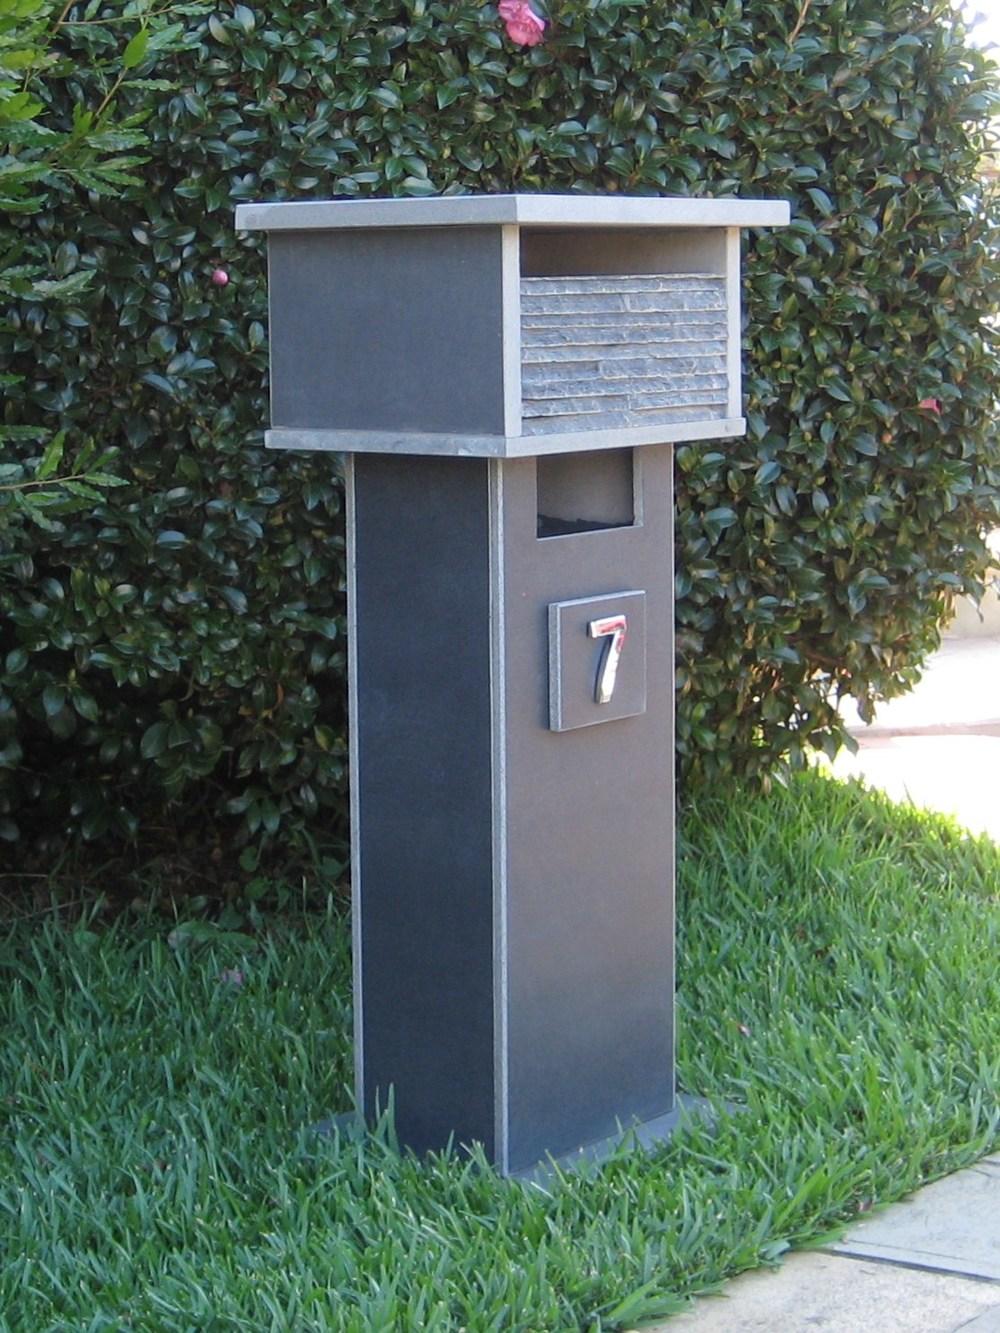 7. Bluestone letterbox solid, aluminium back door with 2 key lock 860cm high top part mesure 300mm x 400mm. $560